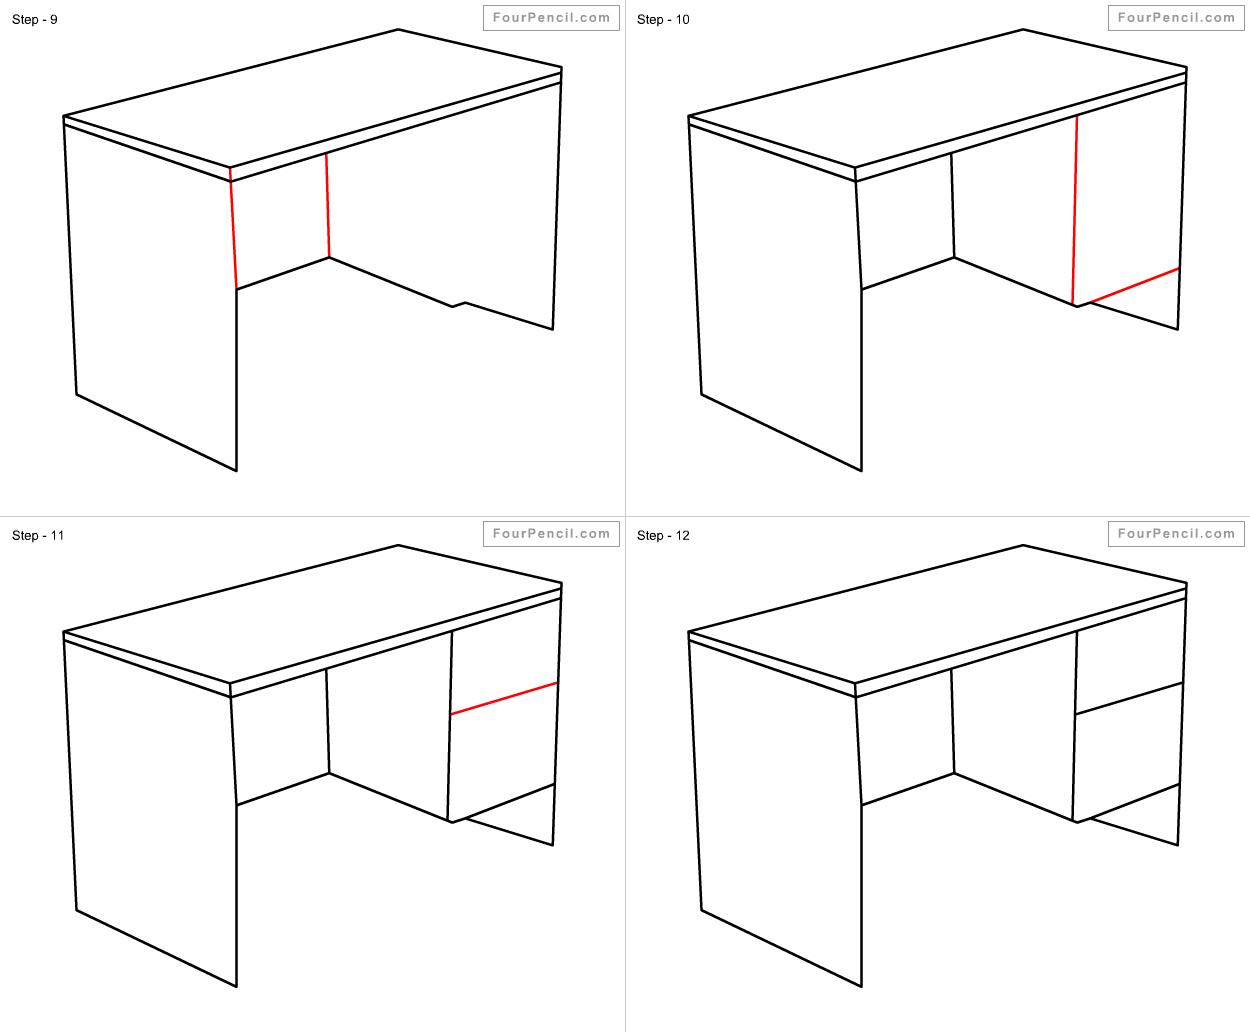 Slide 1 - easy steps desk drawing how to draw Slide 2 - Drawing desk